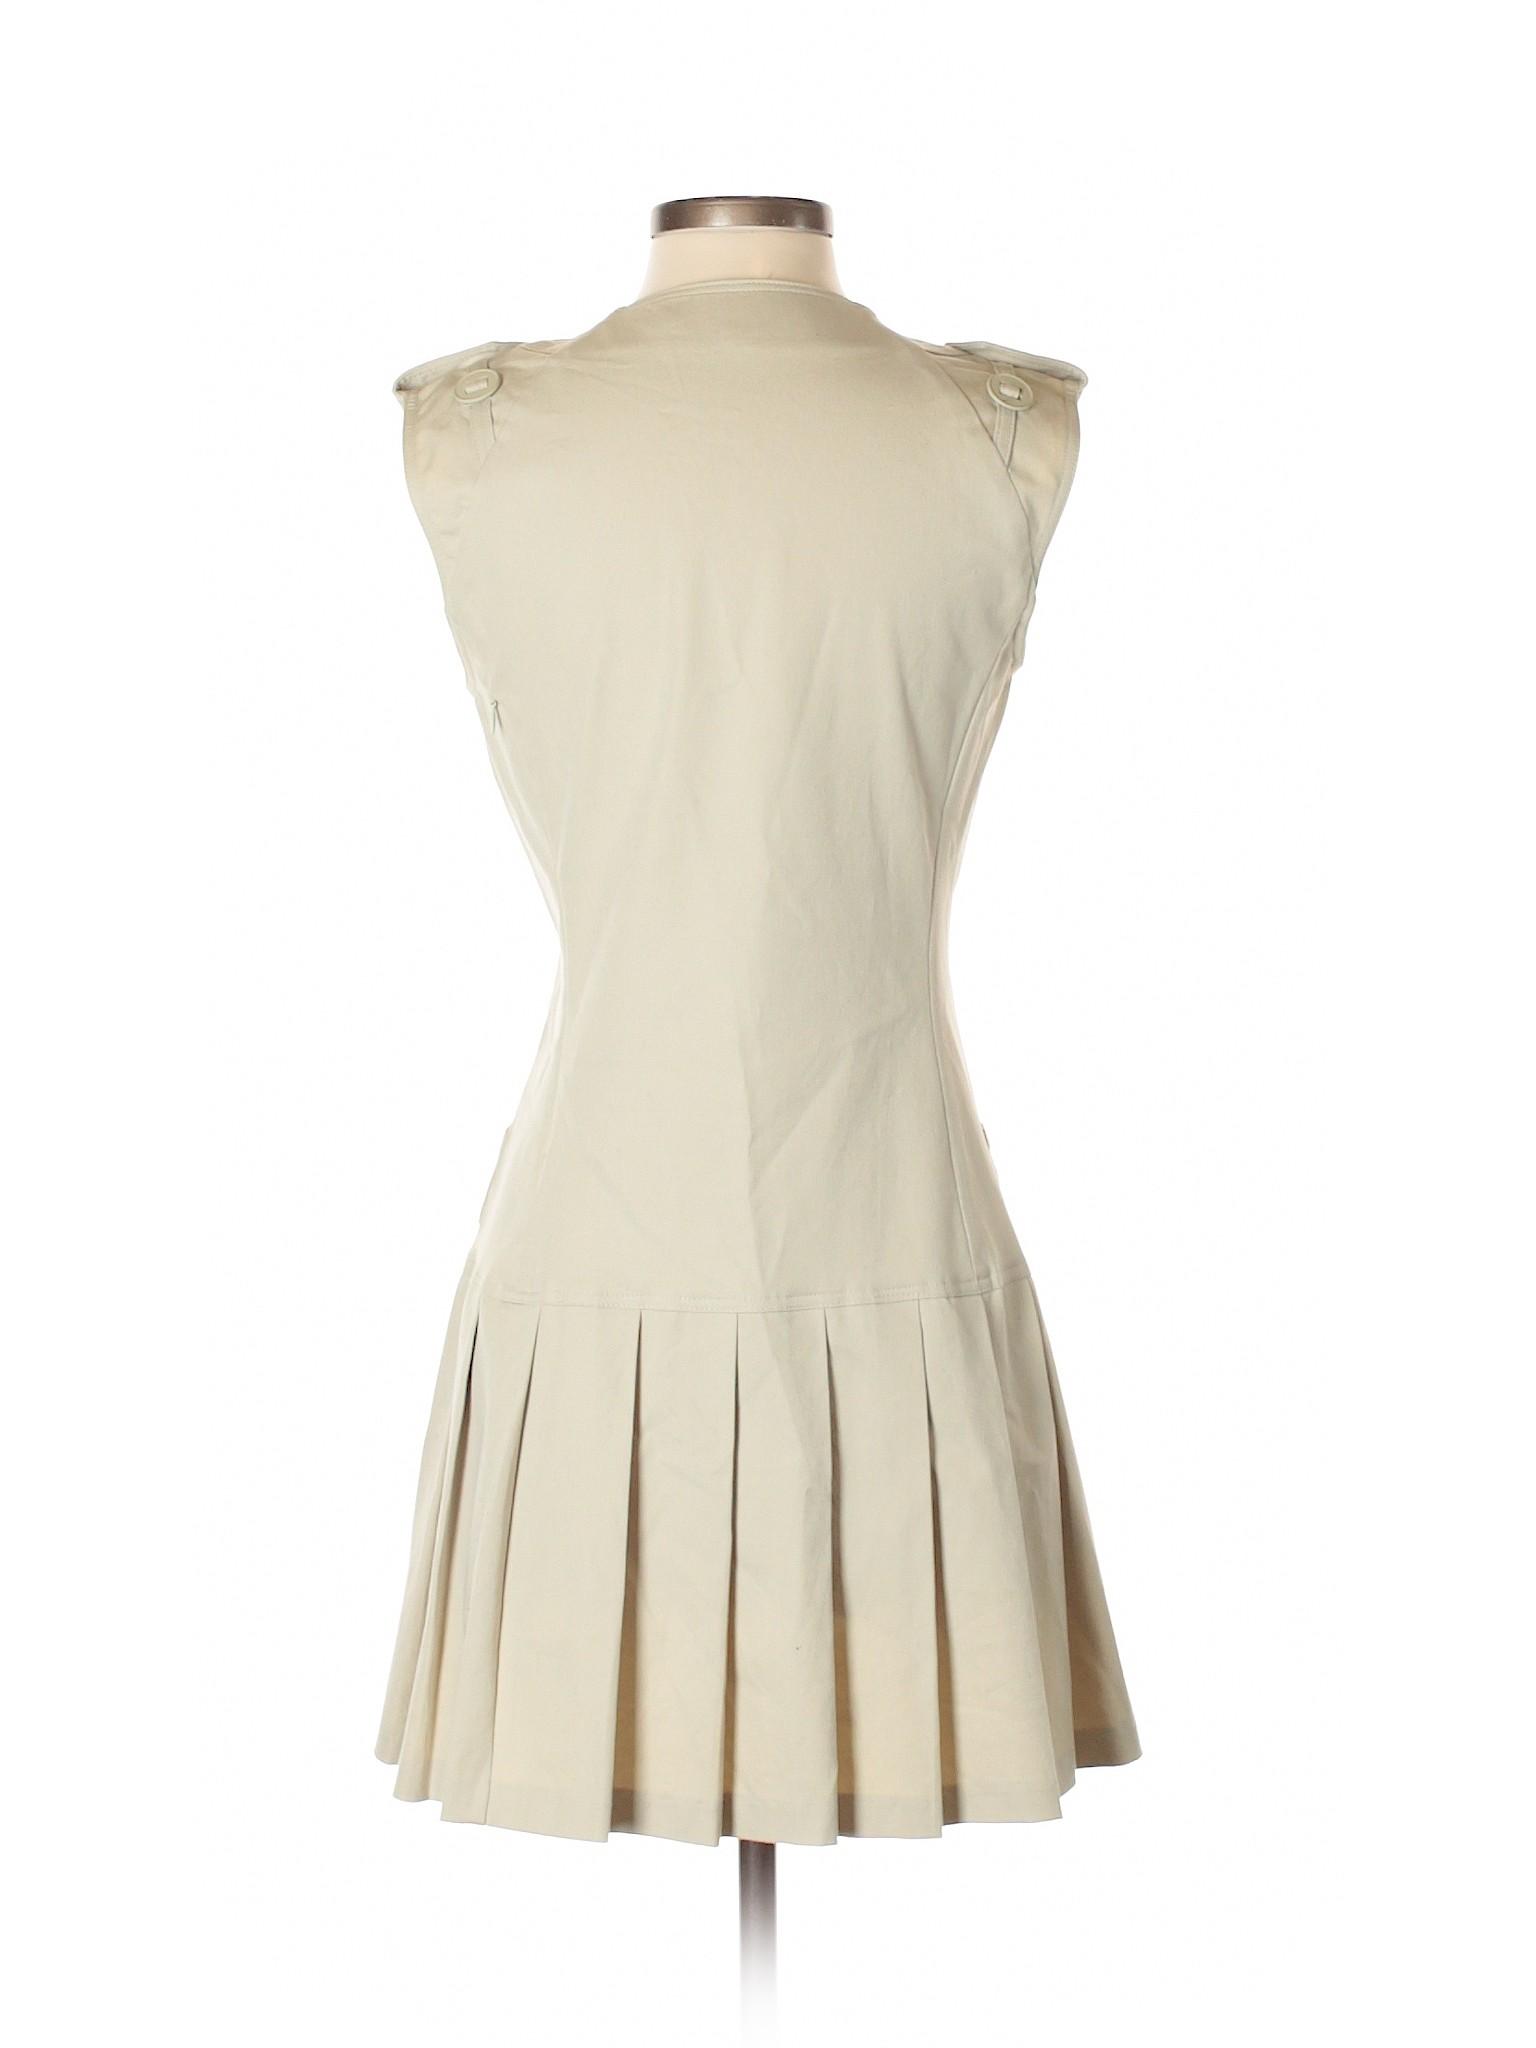 Dress J Casual Rowley Cynthia Maxx T Boutique winter for wxBgX8fTq